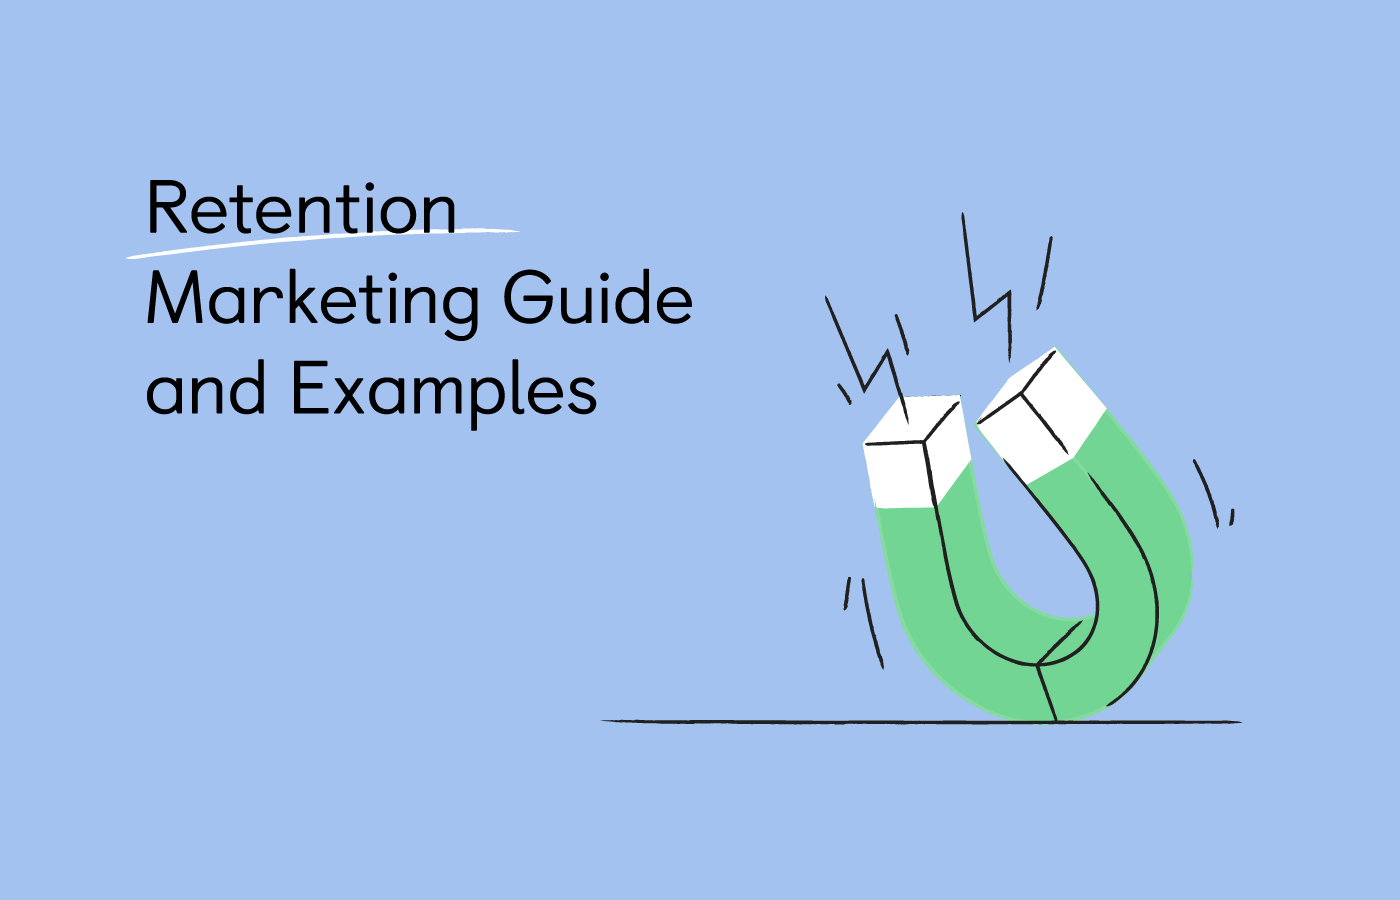 Retention Marketing Guide [8 Customer Retention Marketing Strategy Examples]